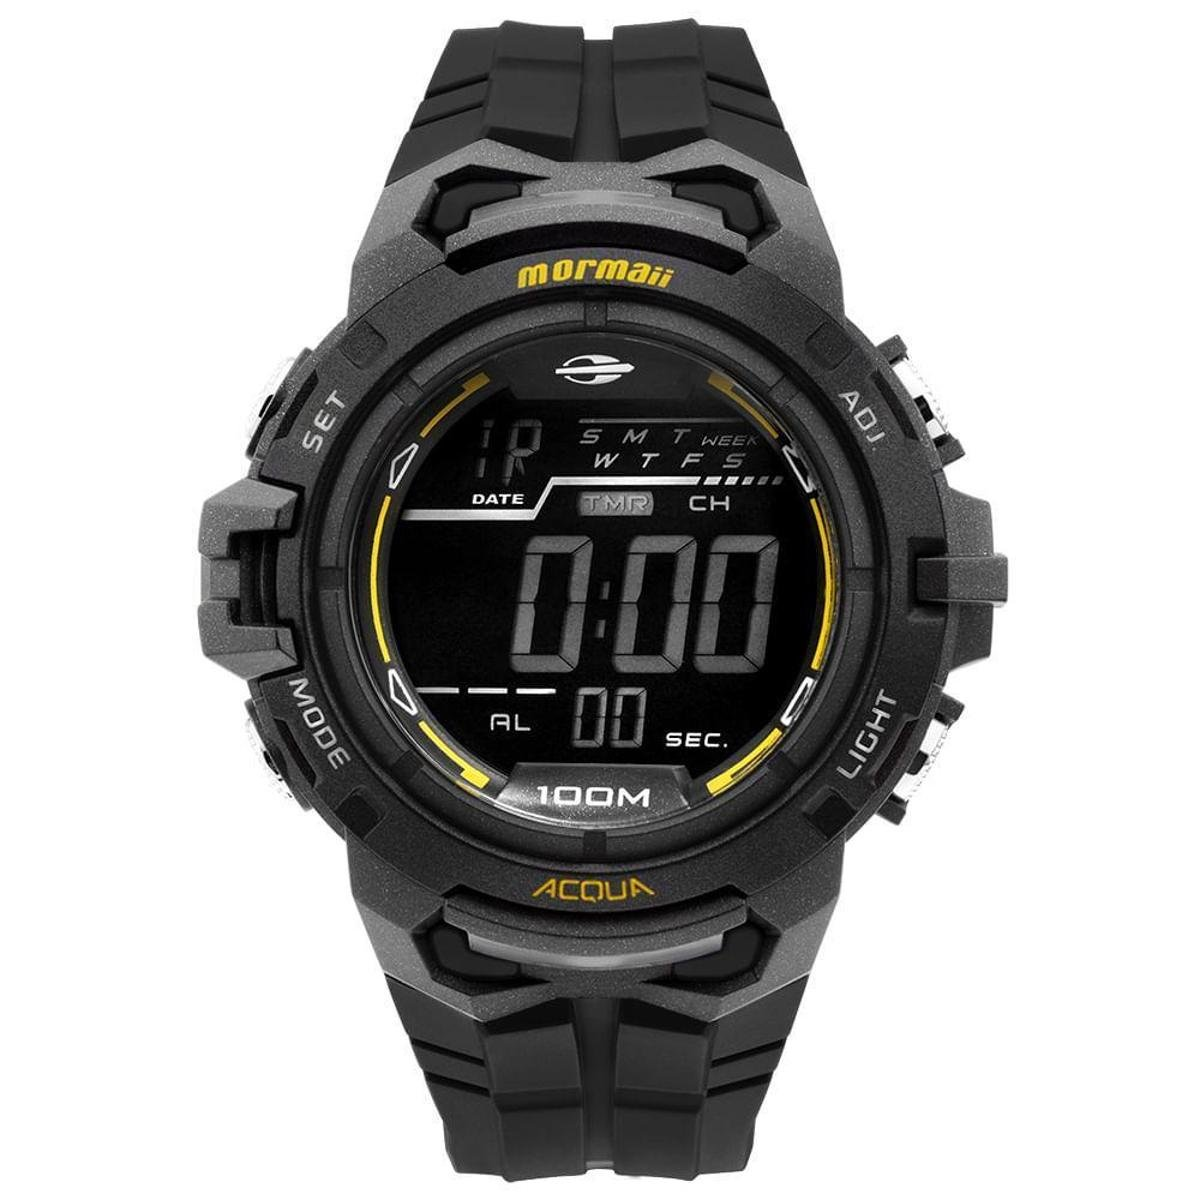 ceea2f4f5ebb3 Relógio Mormaii Masculino Action - MO1147A 8P MO1147A 8P - Preto - Compre  Agora